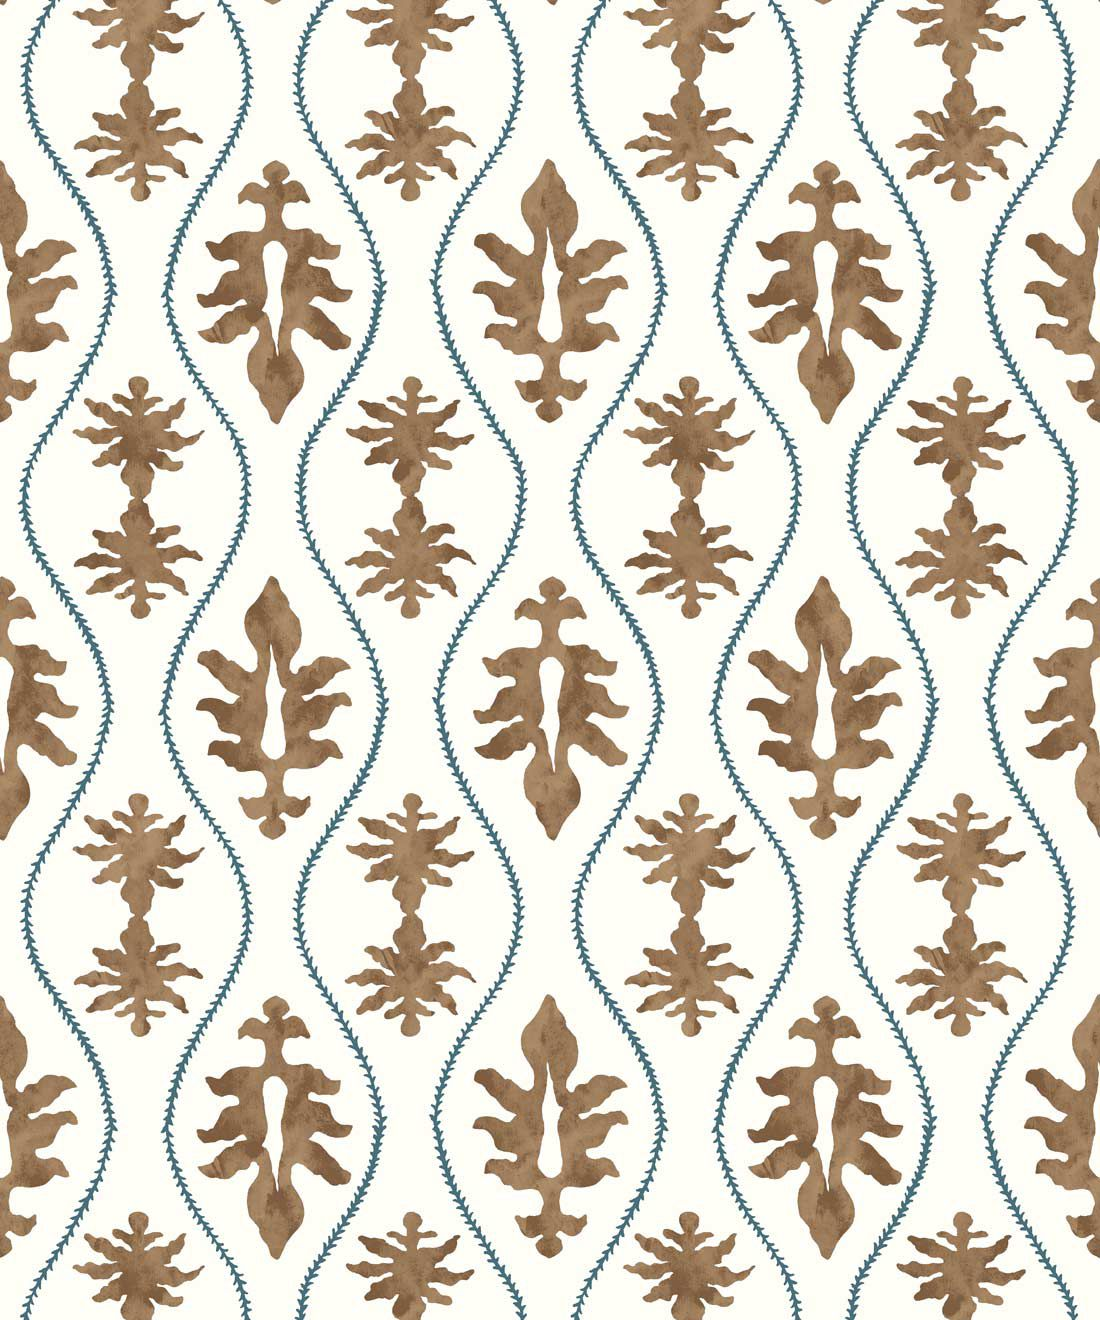 Great Jones Wallpaper • Dianne Bergeron • Chestnut •Swatch